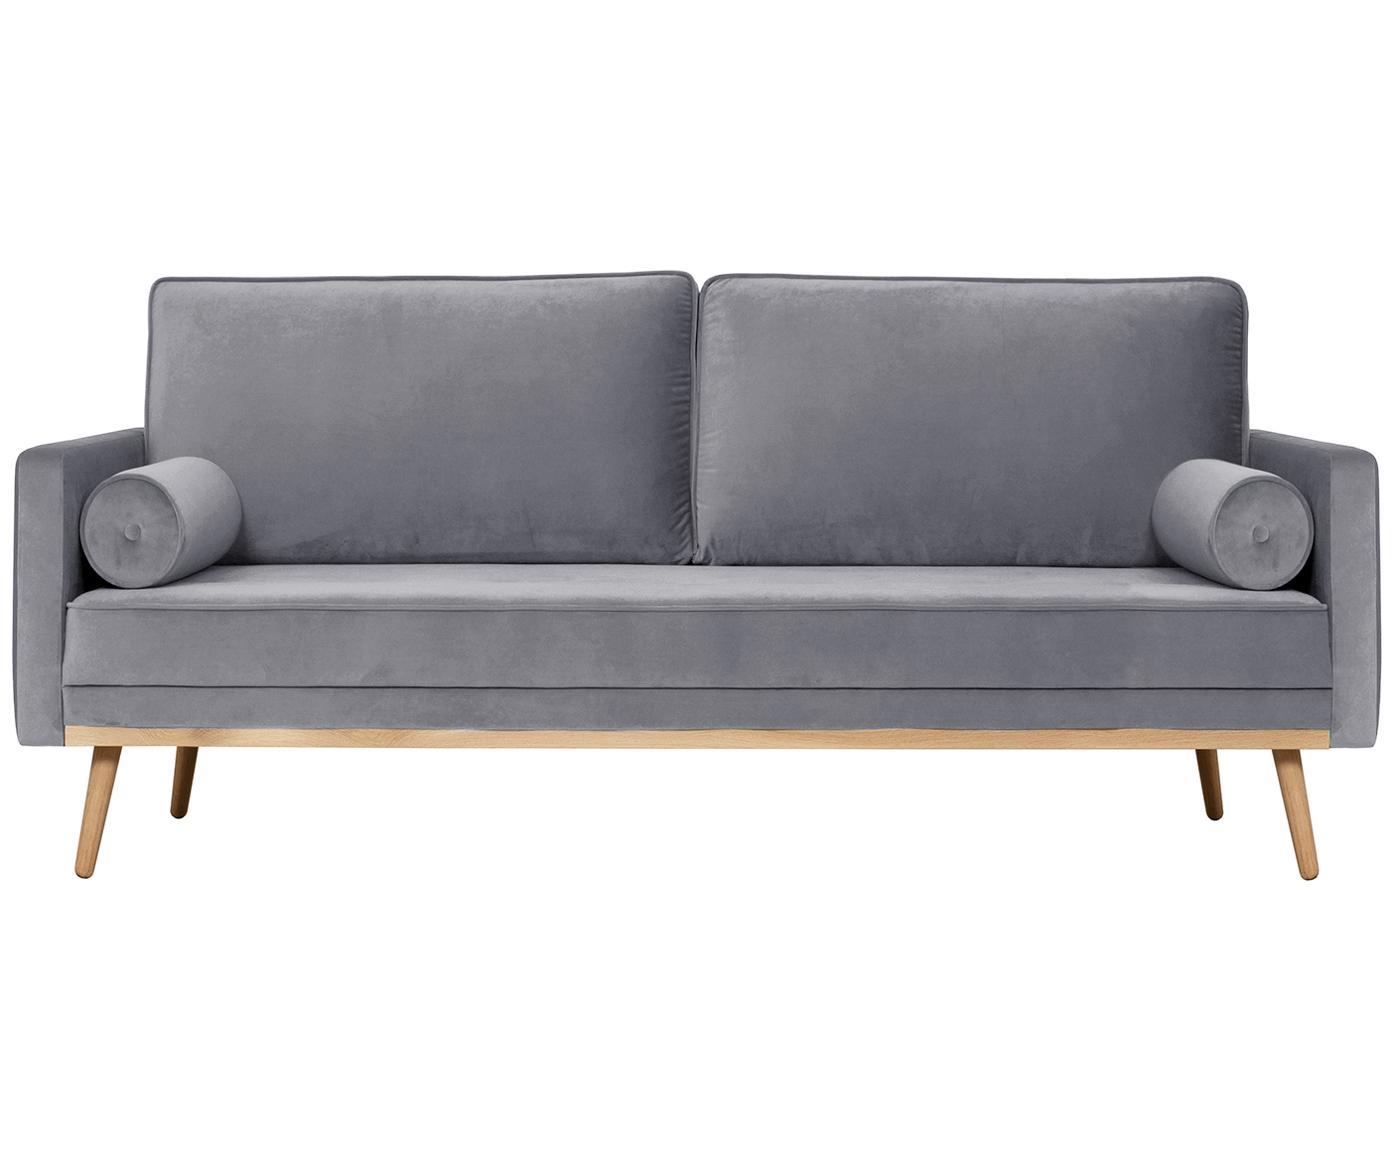 Samt-Sofa Saint (3-Sitzer), Bezug: Samt (Polyester) 35.000 S, Gestell: Massives Eichenholz, Span, Samt Grau, B 210 x T 93 cm